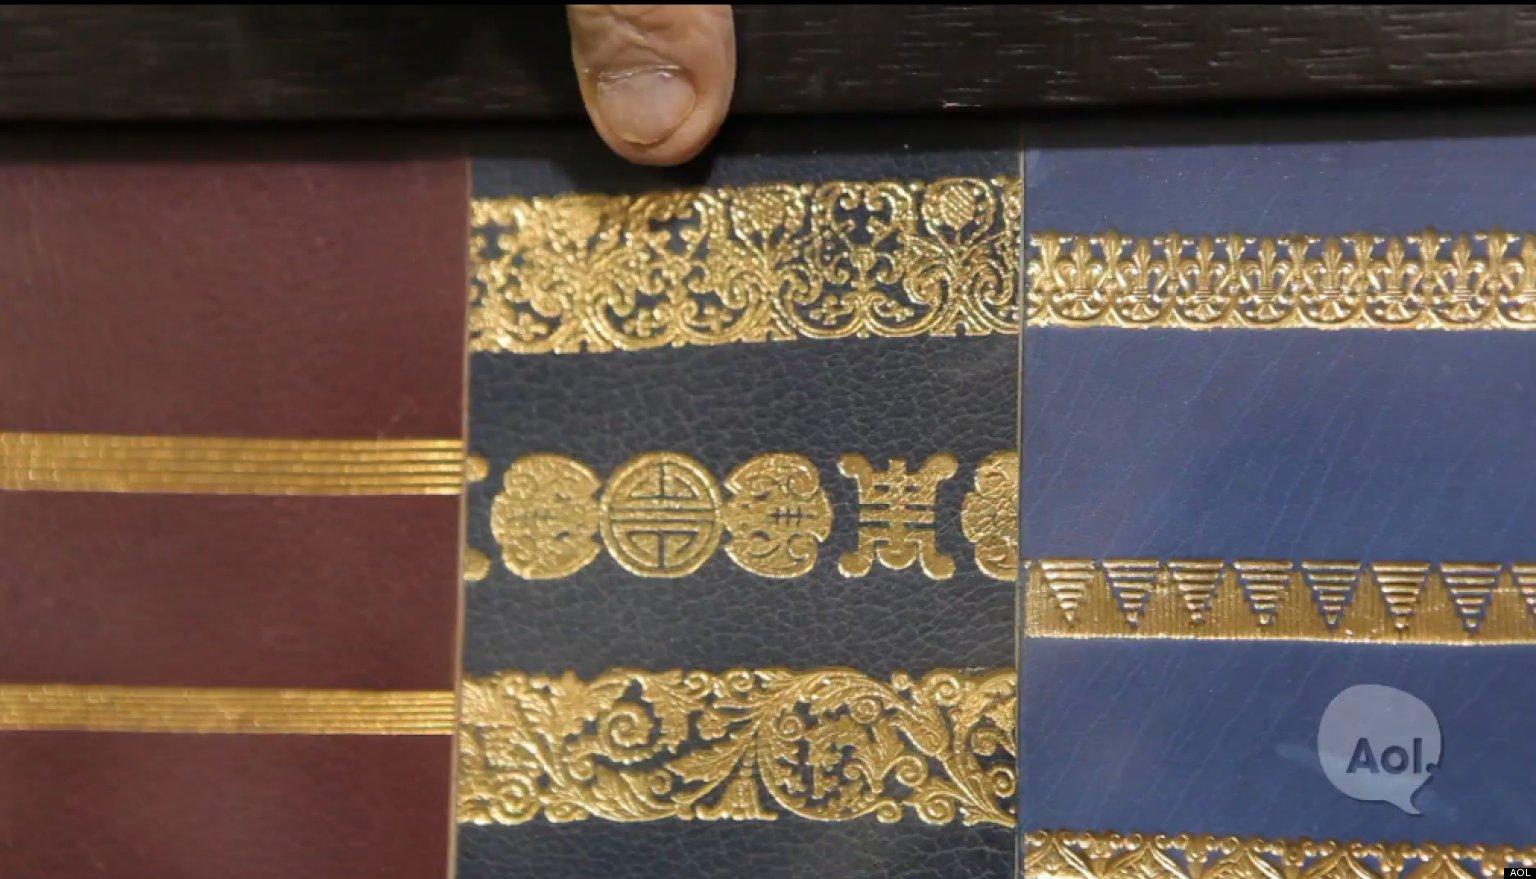 WATCH: Art Of The Bookbinder